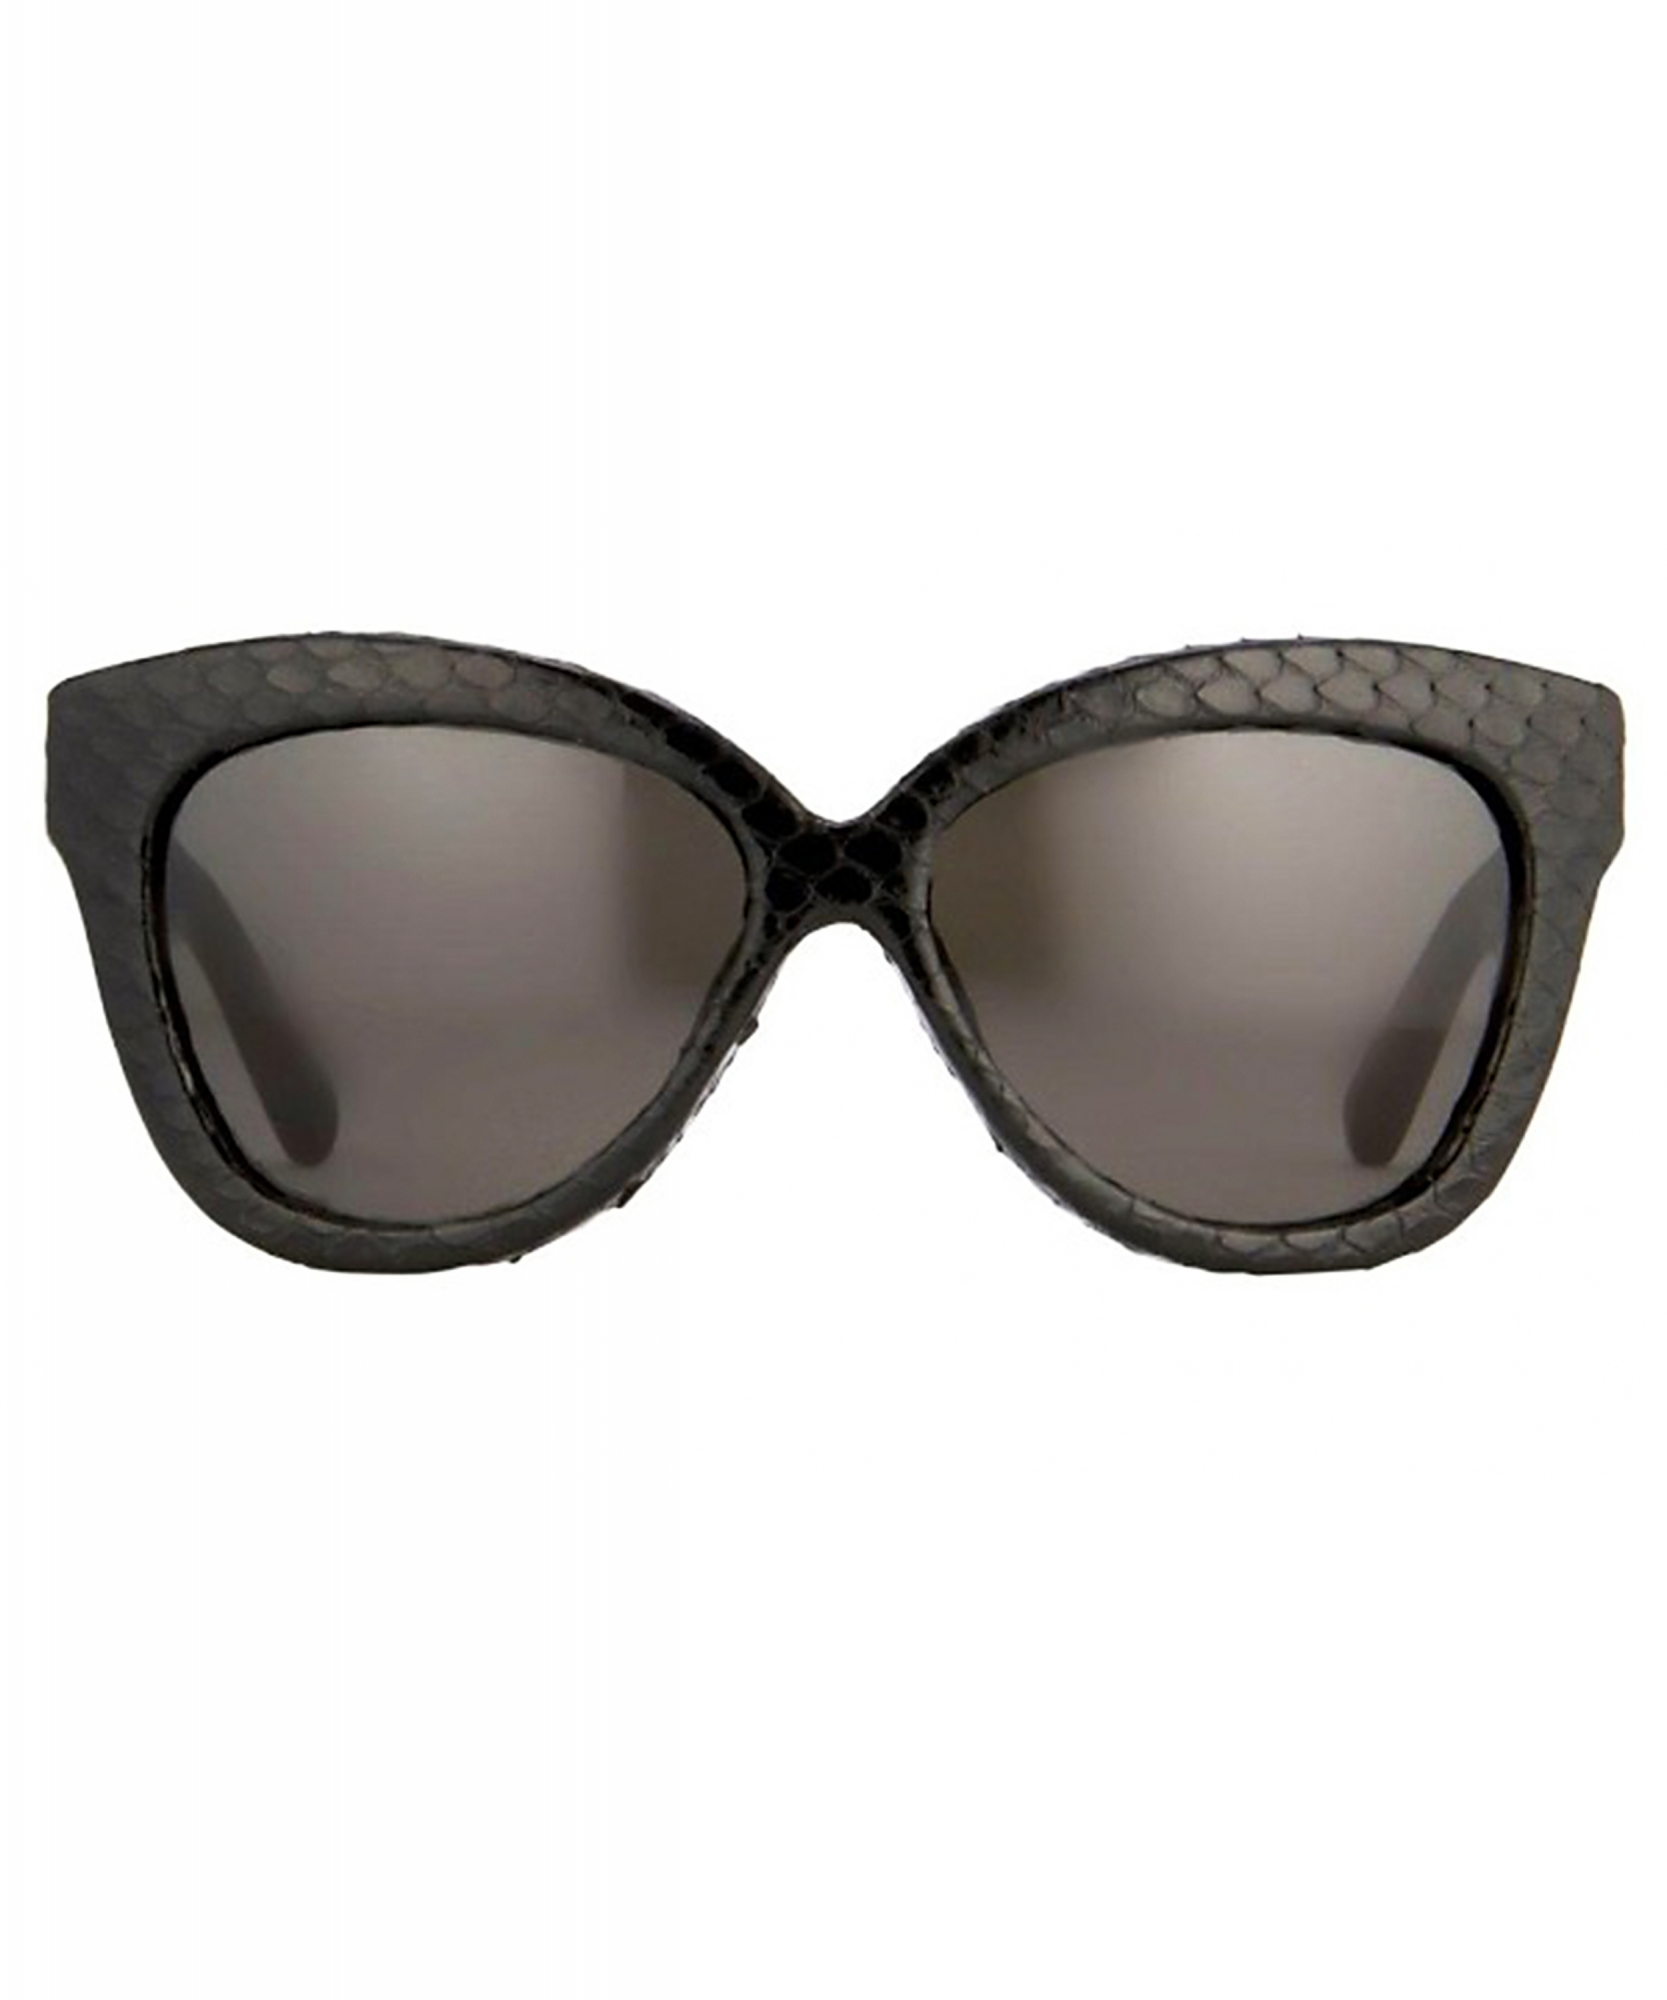 18bac565ad3f Linda Farrow Cat-Eye Frame Python-Coated Sunglasses